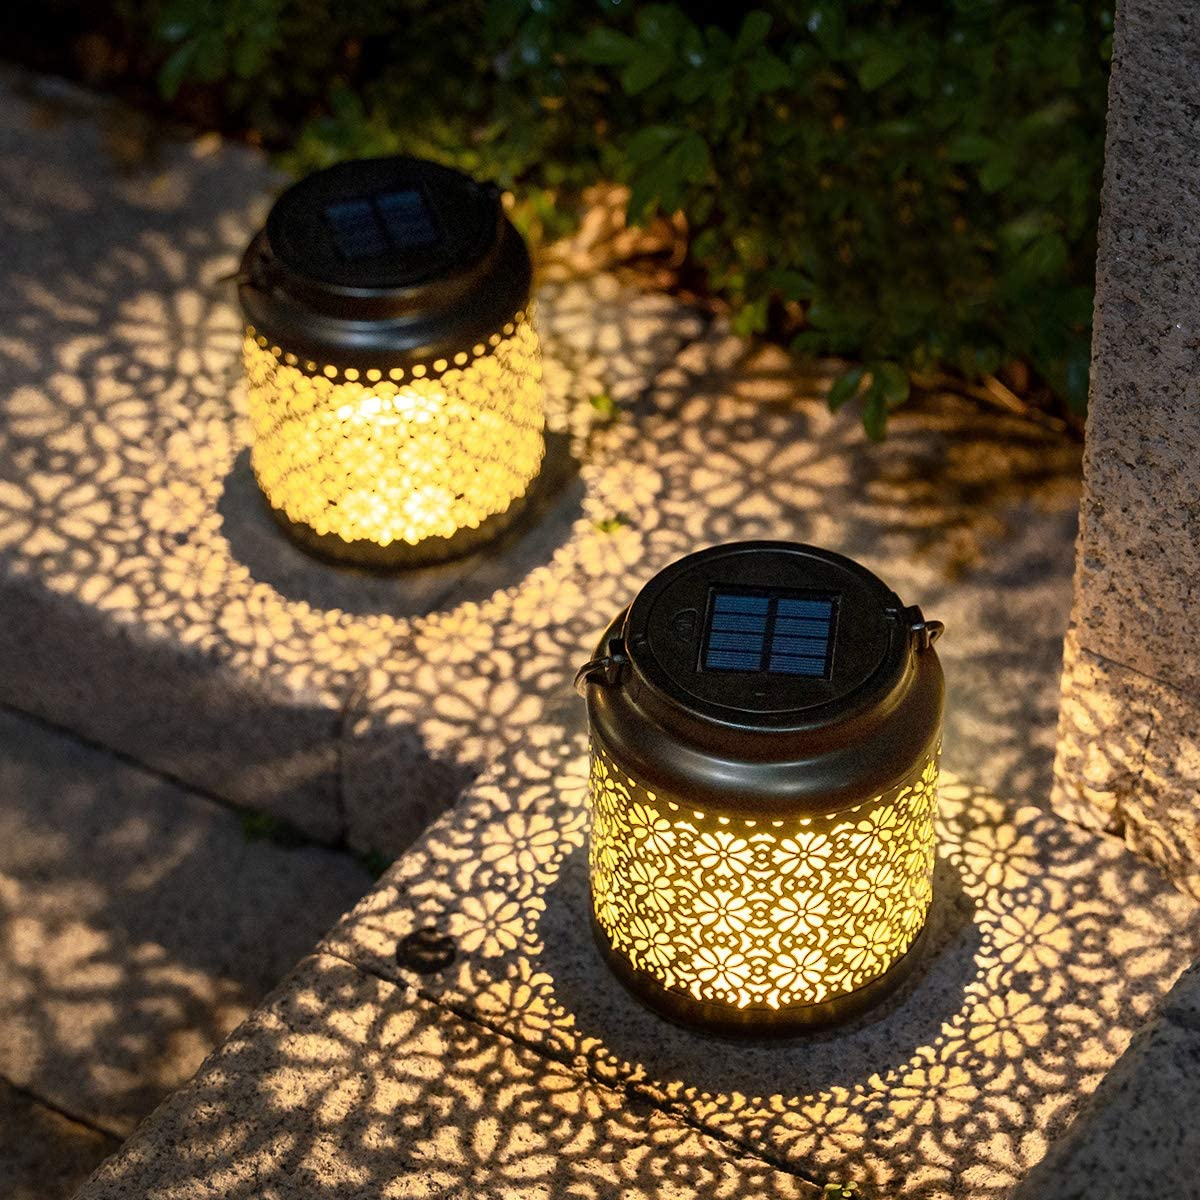 Solar Metal Lantern Outdoor Garden Decorative Hanging LED Lights Waterproof Landscape Lighting 2 Pack